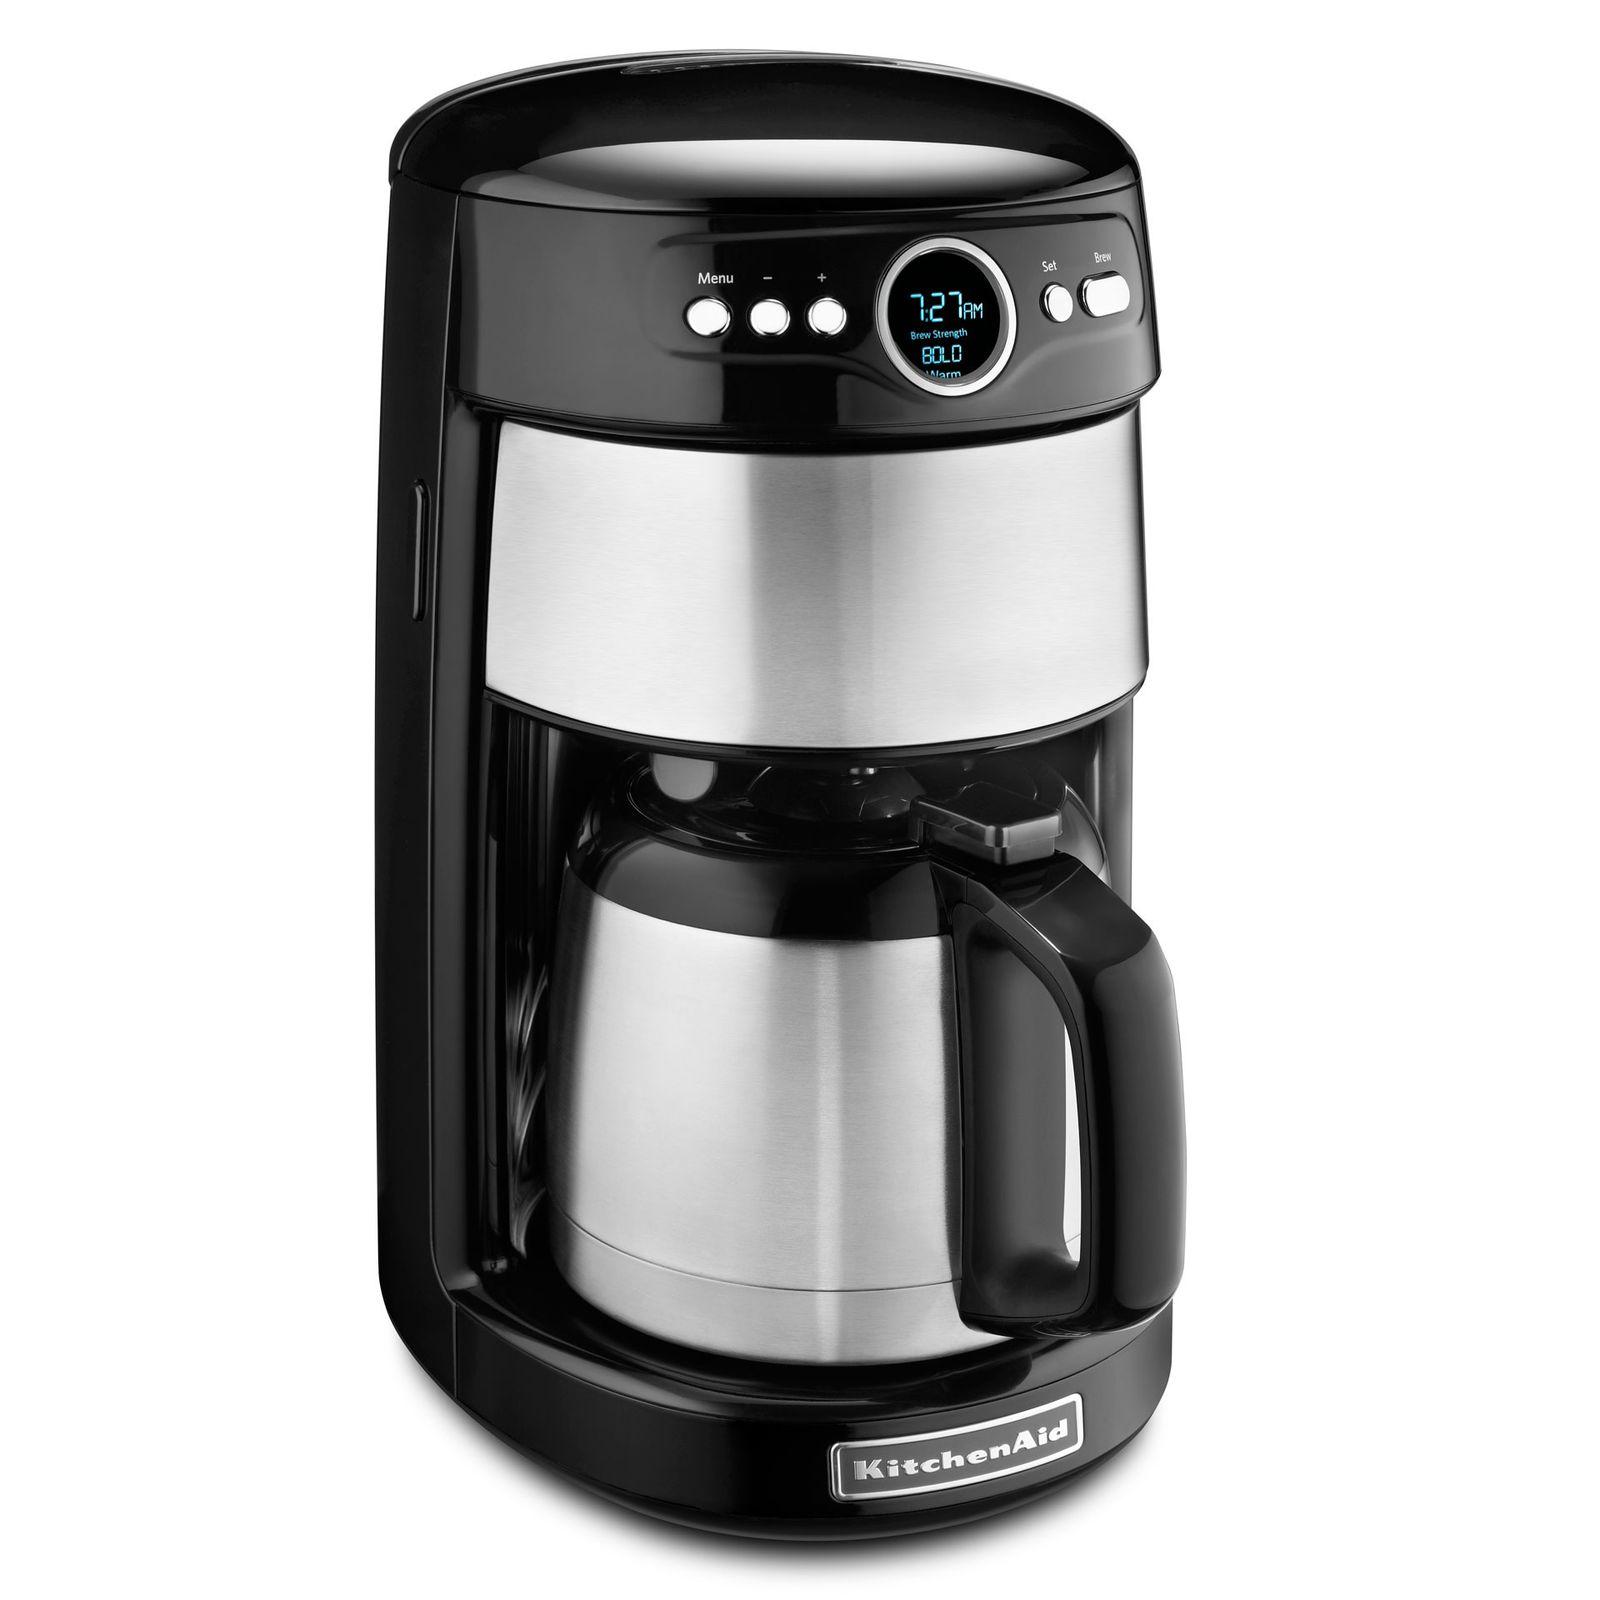 5500956670869 ghk kitchenaid 12 cup thermal carafe coffeemaker kcm1203 s2 Kitchenaid  Cup Coffee Maker Kcmob